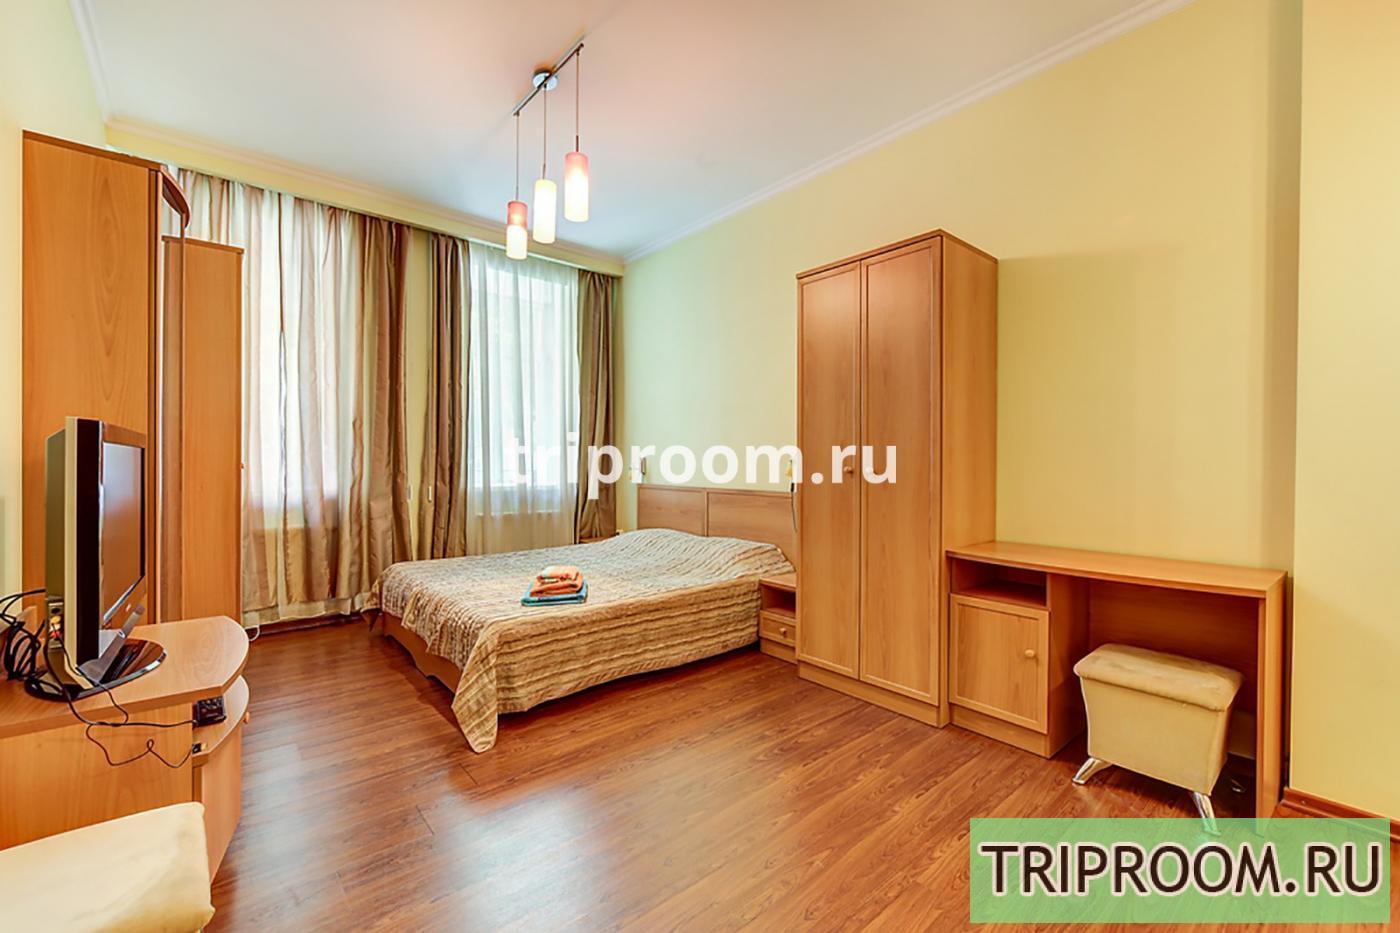 1-комнатная квартира посуточно (вариант № 15527), ул. Канала Грибоедова набережная, фото № 8